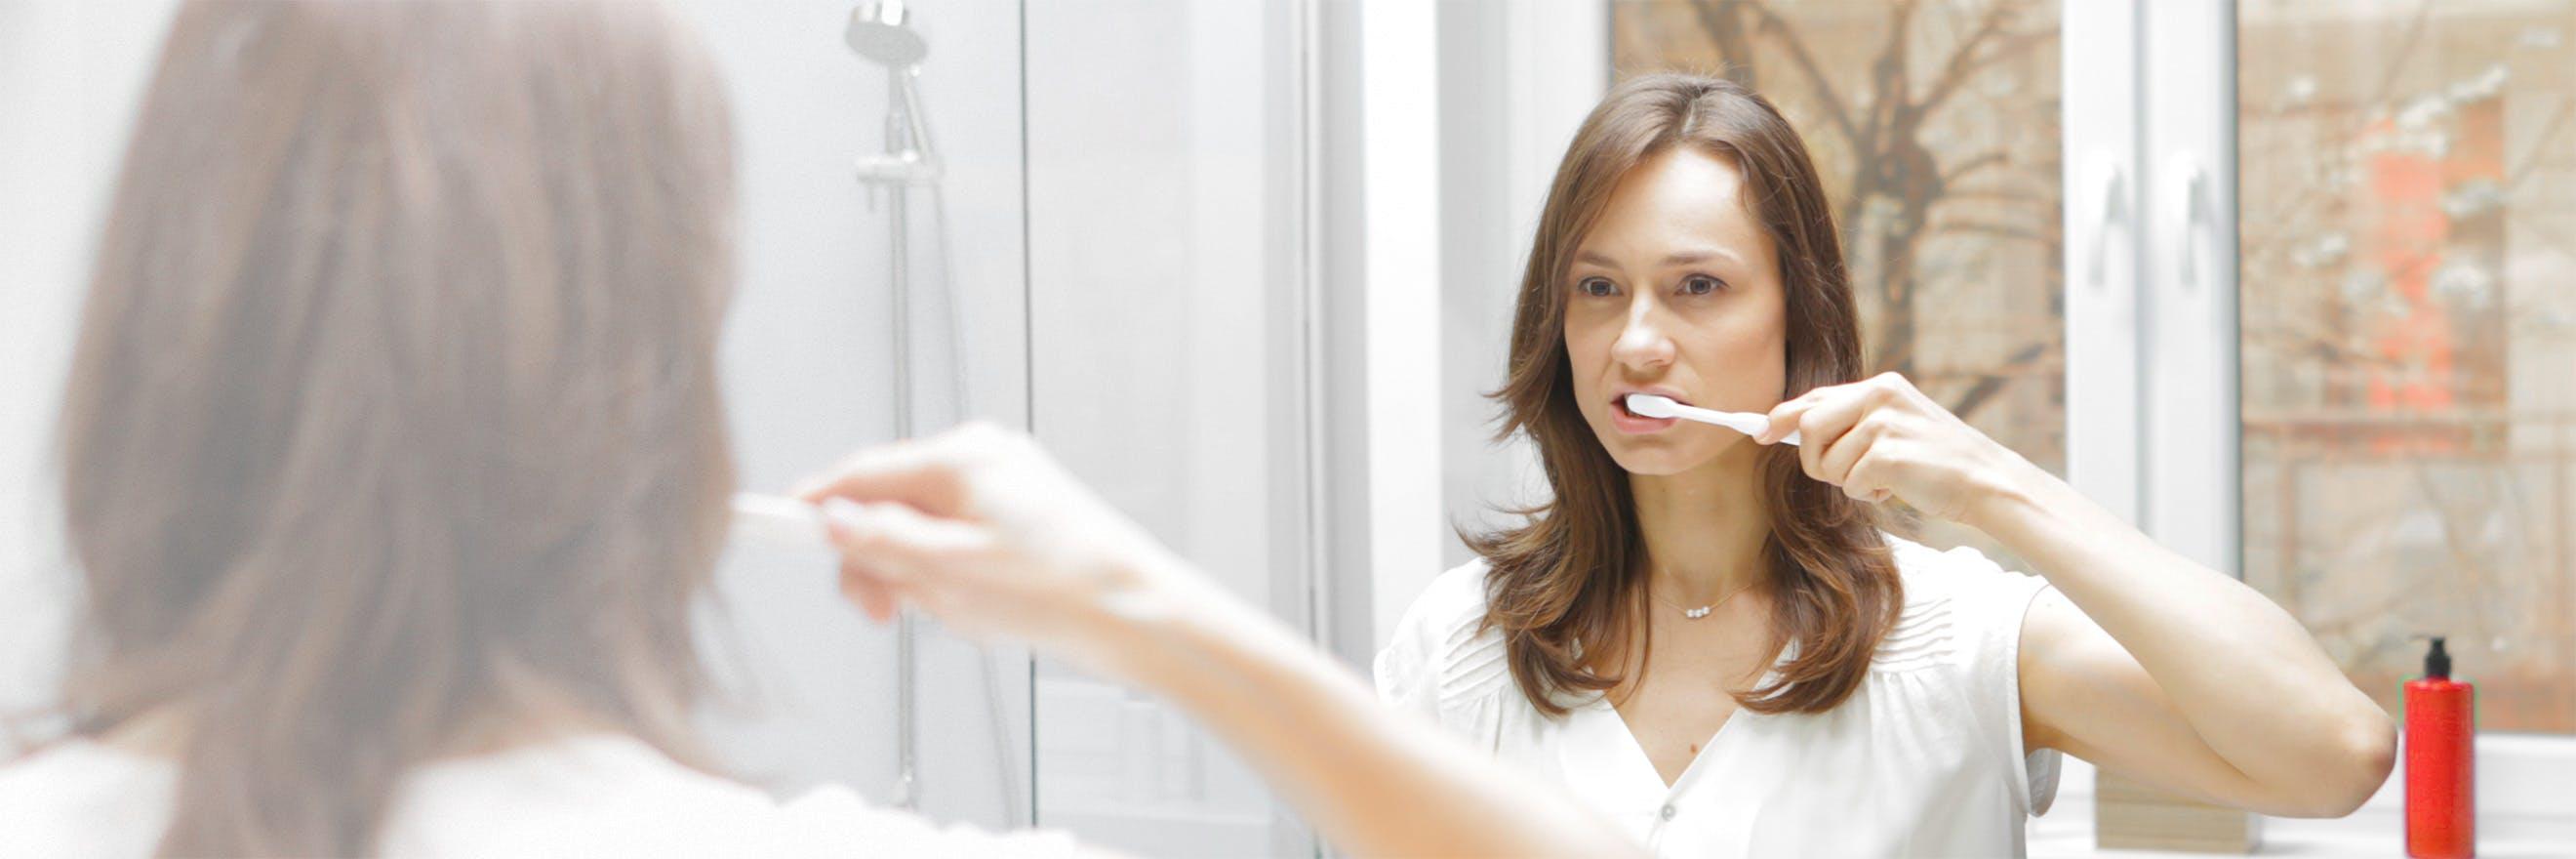 Woman brushing her teeth